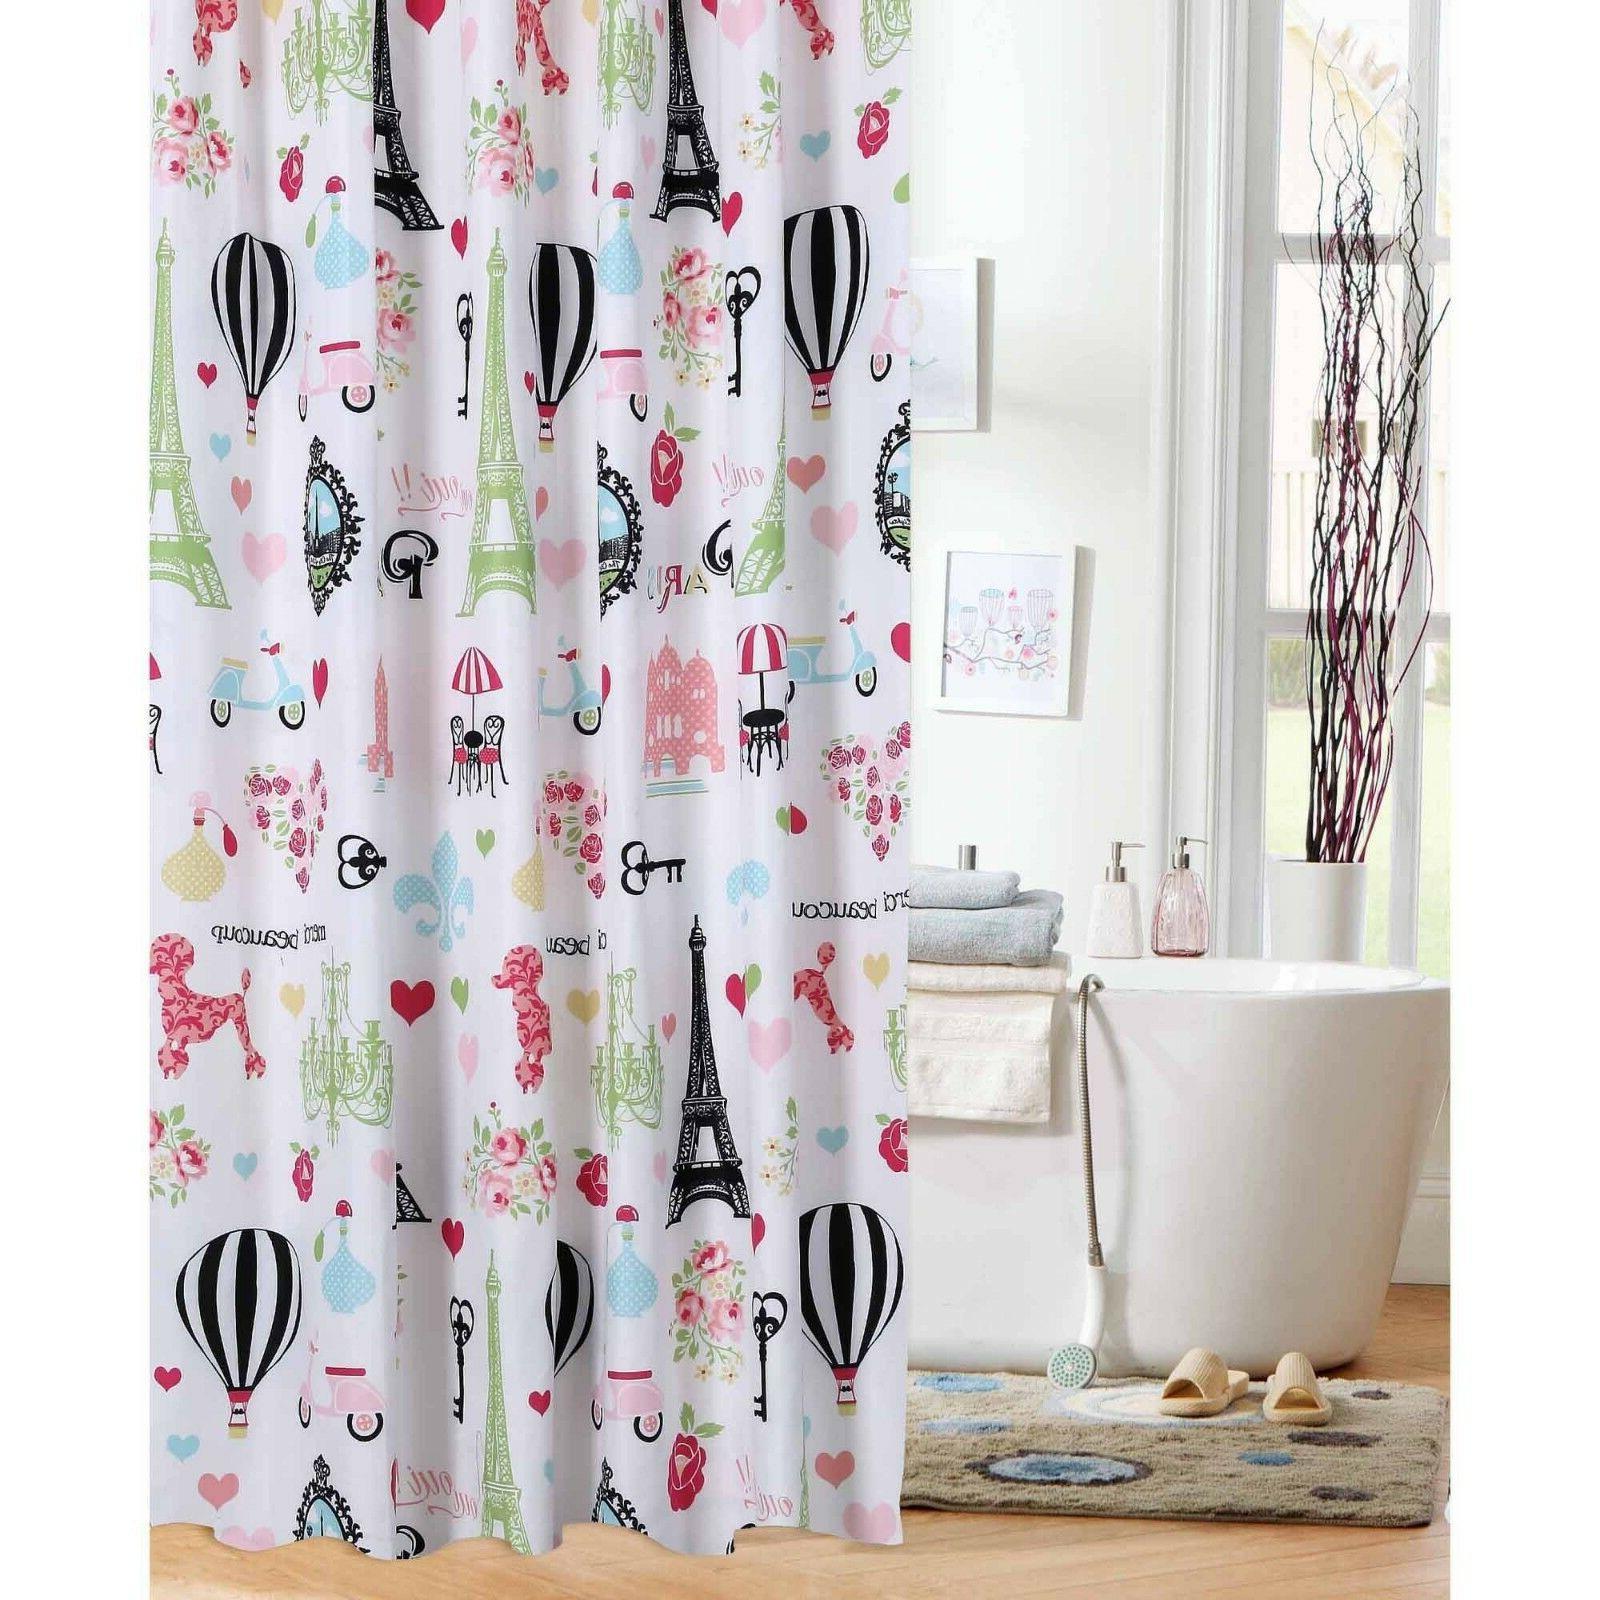 Eiffel Tower Paris Shower Curtain - Bathroom Decor